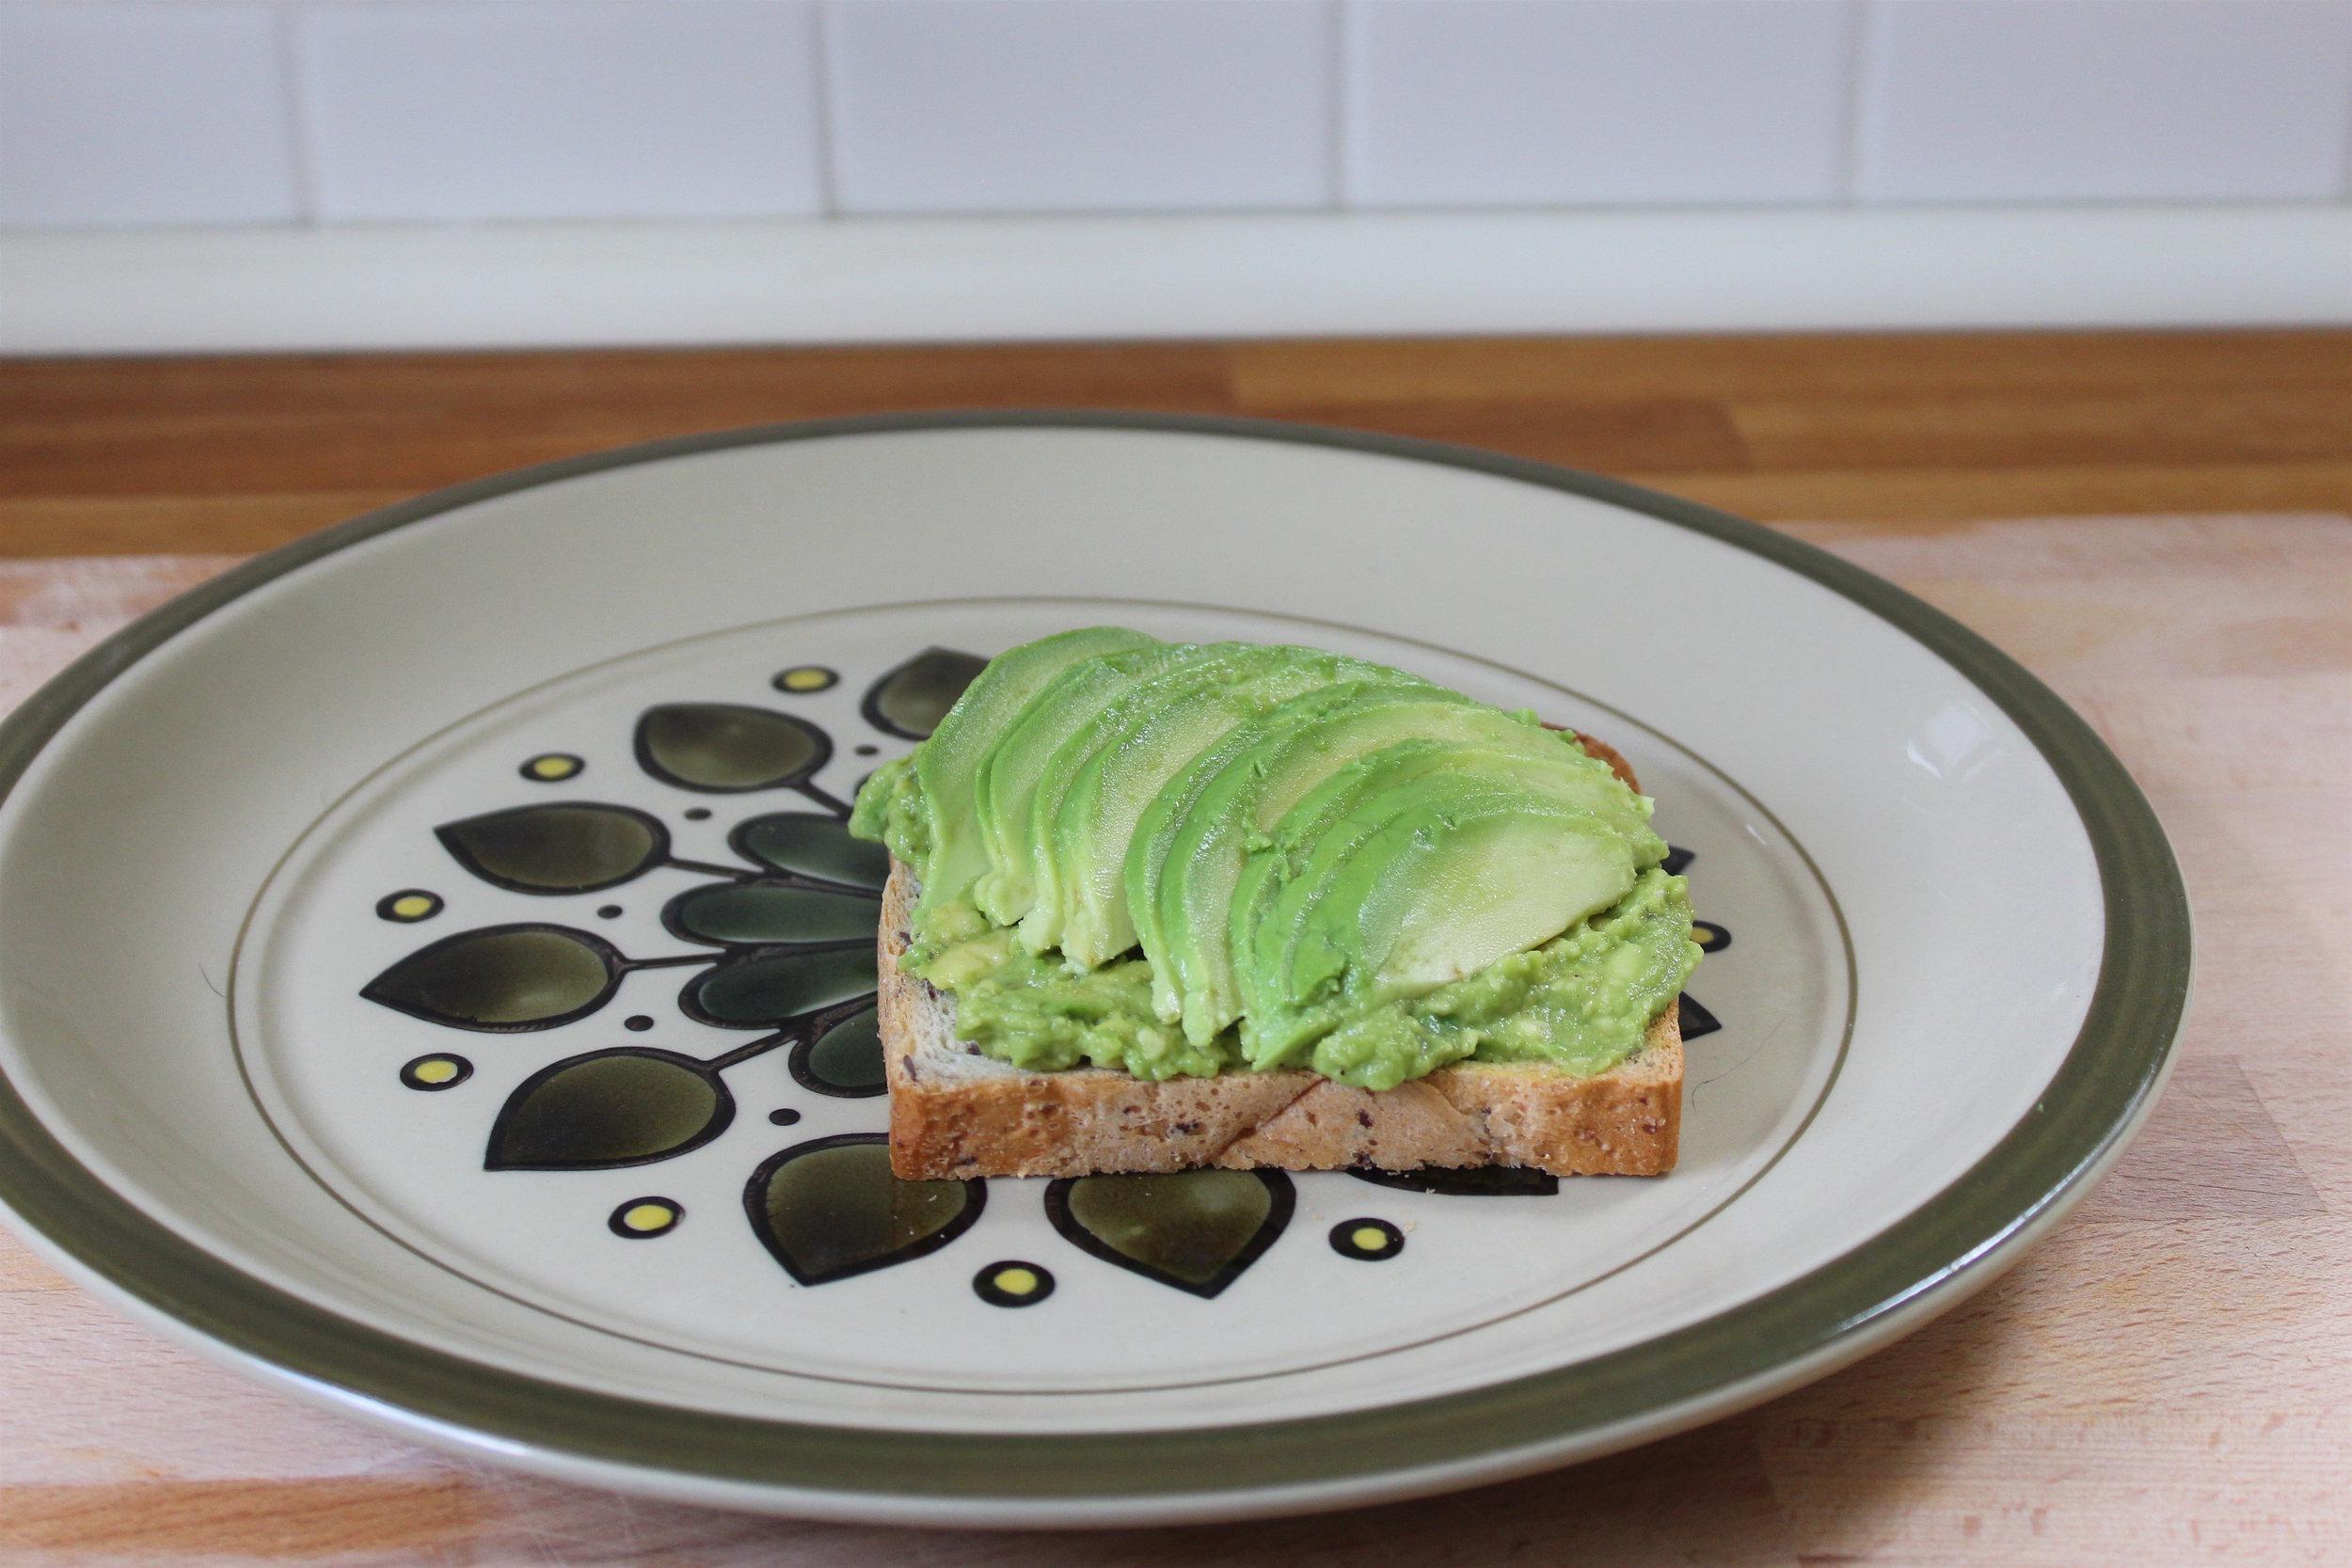 Babe Crafted_Rollin Oats_Brunch Recipe_Citrus Avocado Toast_6.jpg